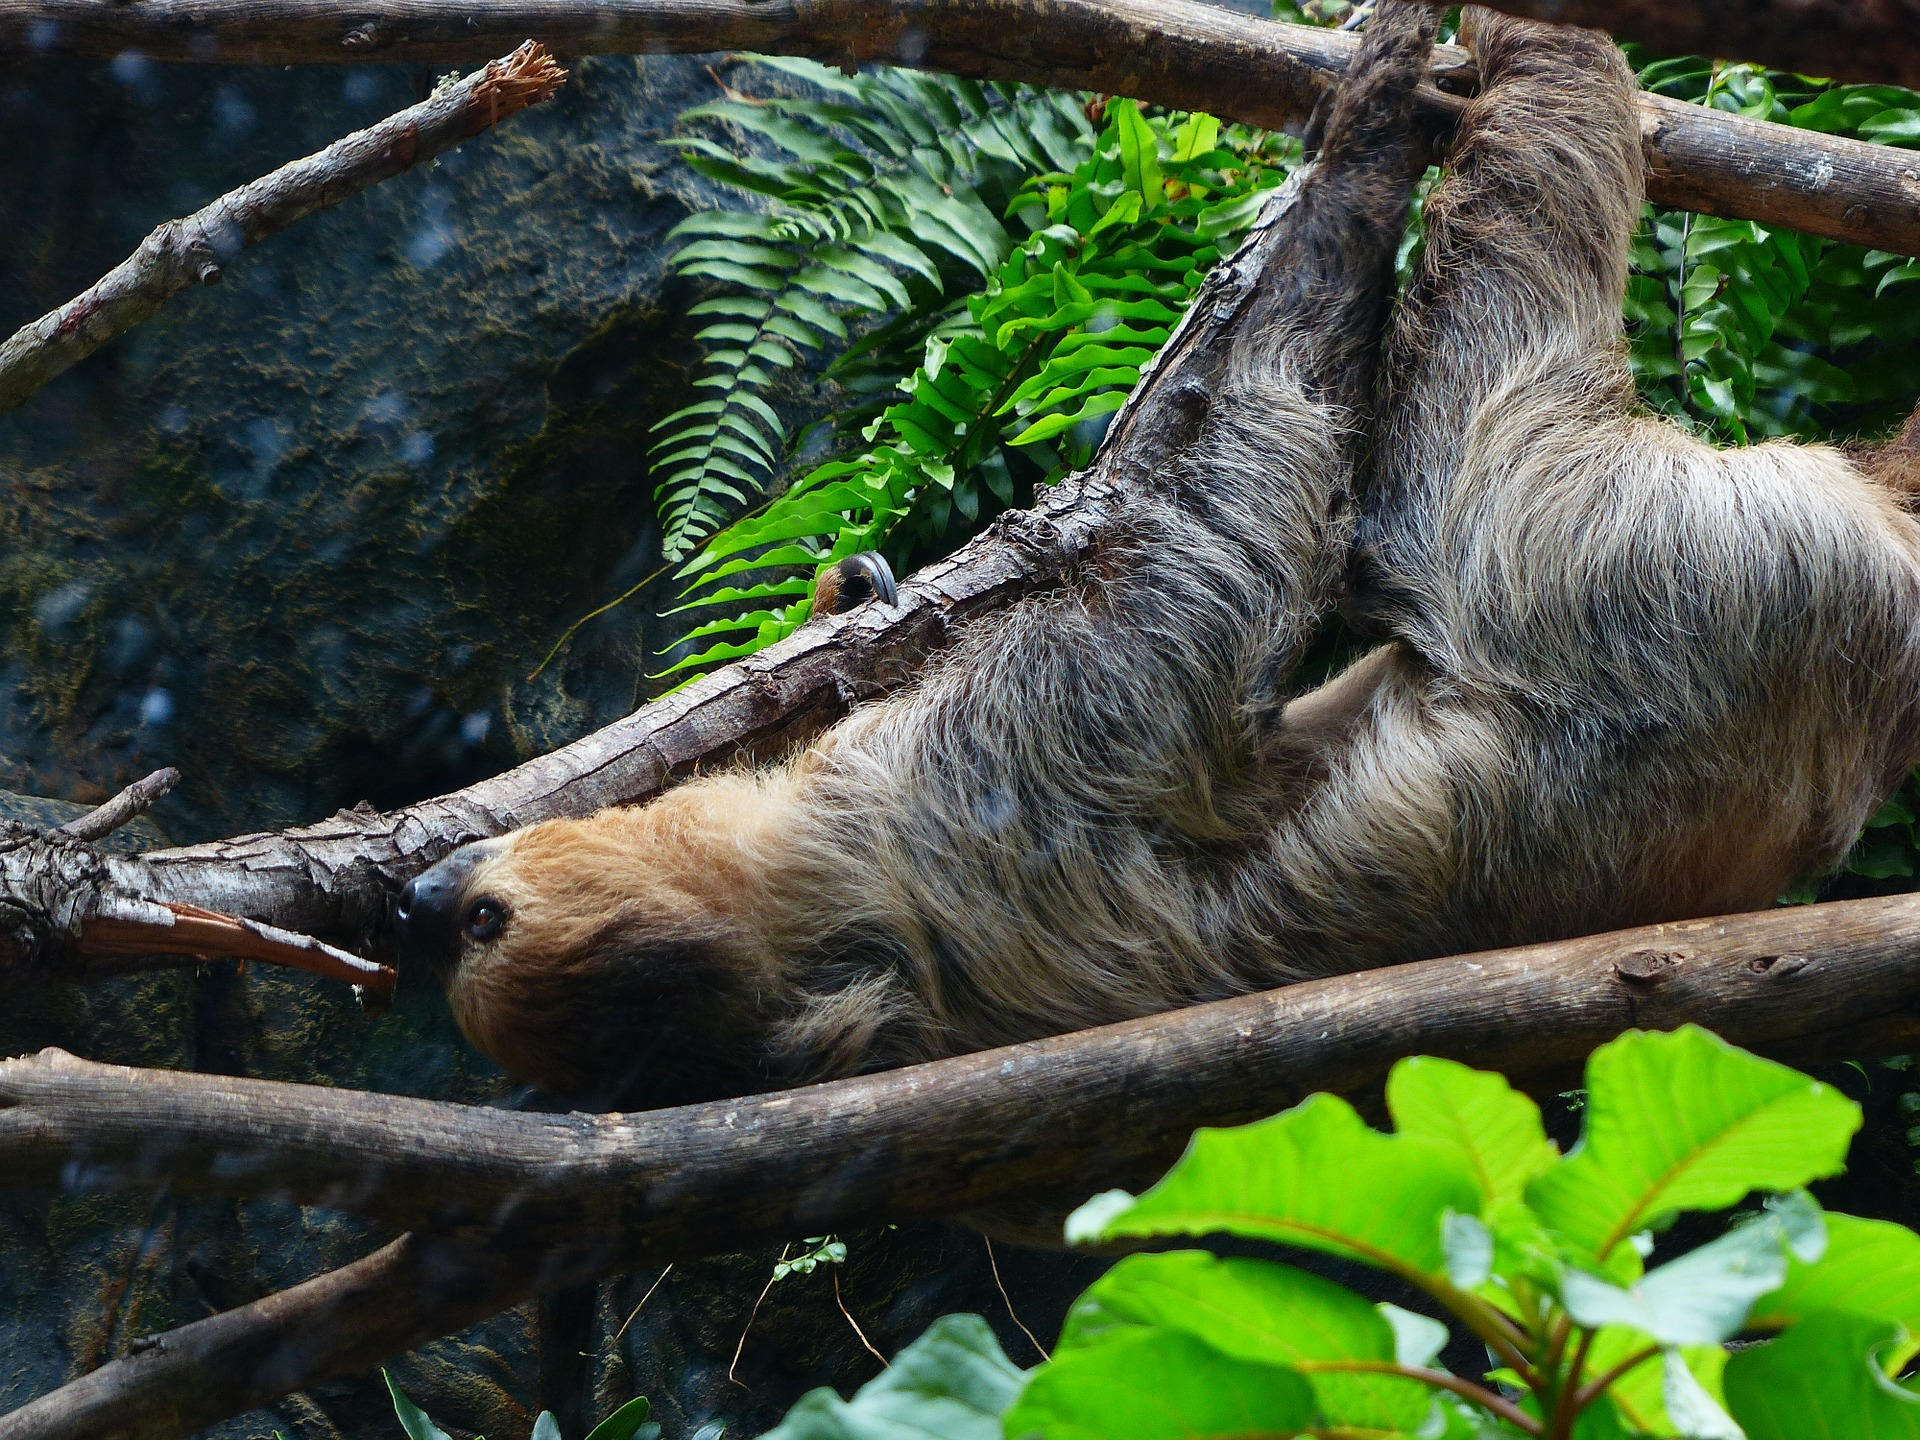 sloth-407088_1920-1